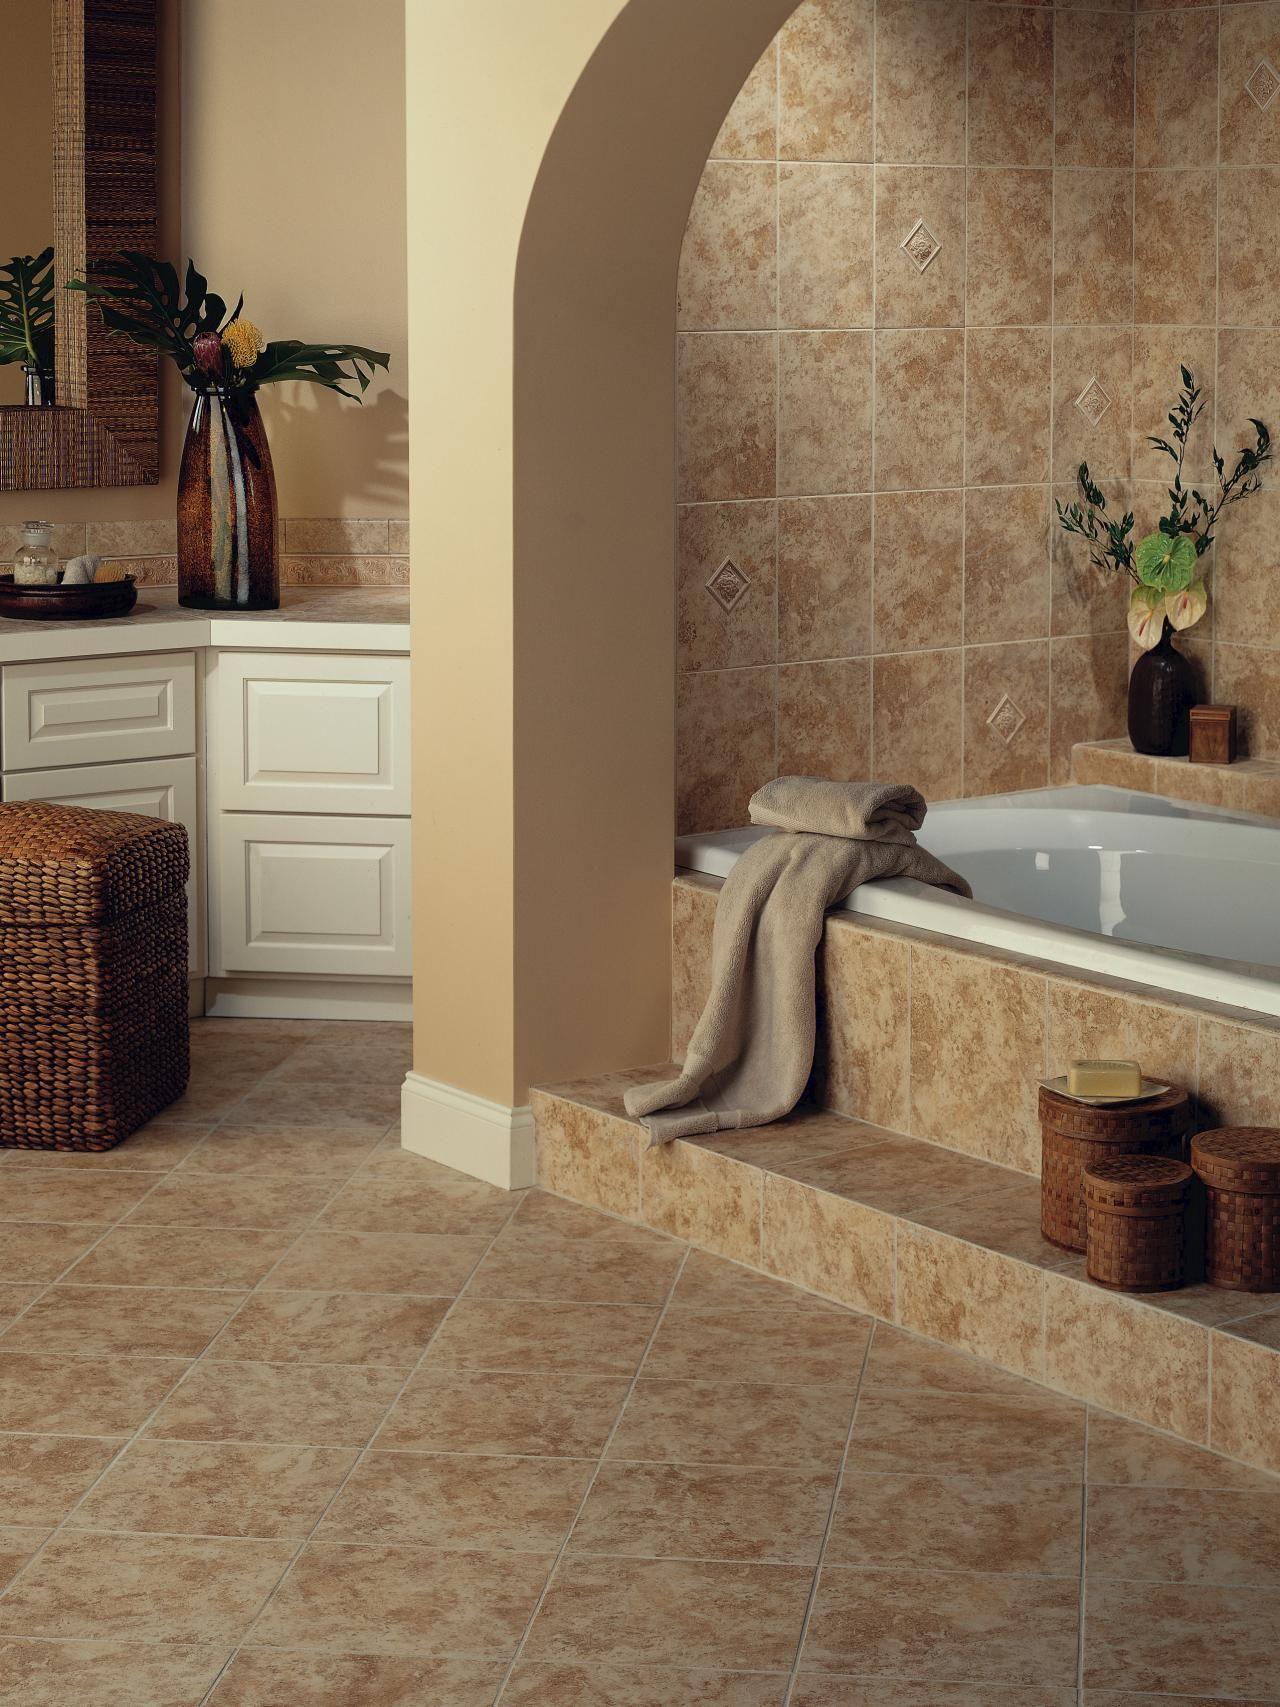 Why Homeowners Love Ceramic Tile Floor Tile Design Bathroom Tile Designs Latest Bathroom Tiles Design